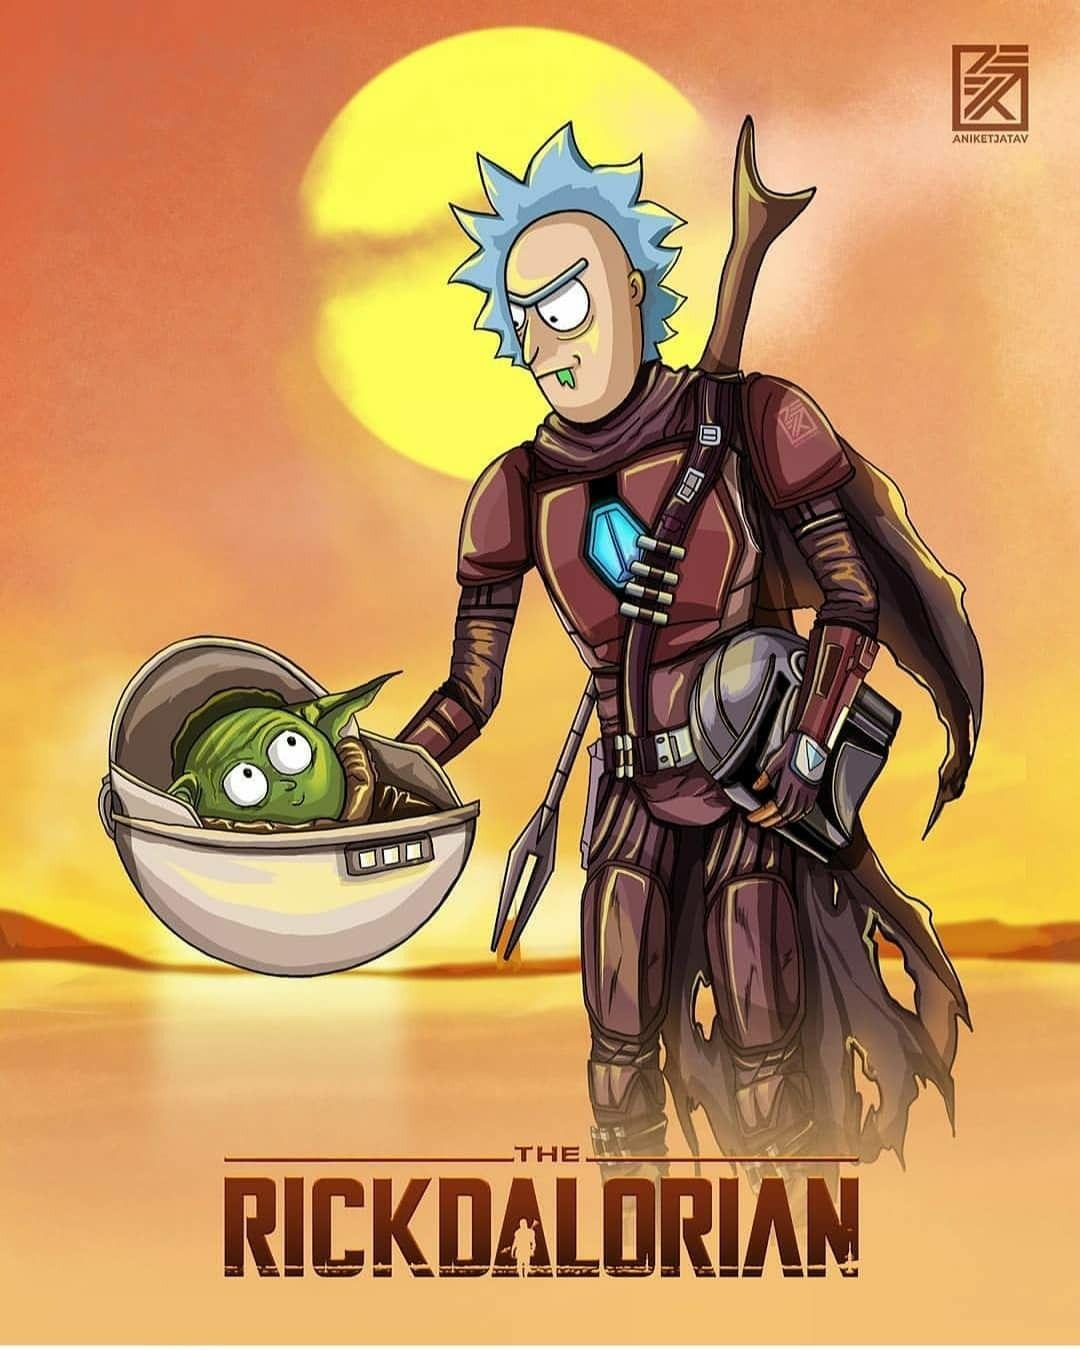 Pin By Konstantine Ratoshnuk On Rick And Morty Rick And Morty Poster Rick And Morty Crossover Rick And Morty Drawing